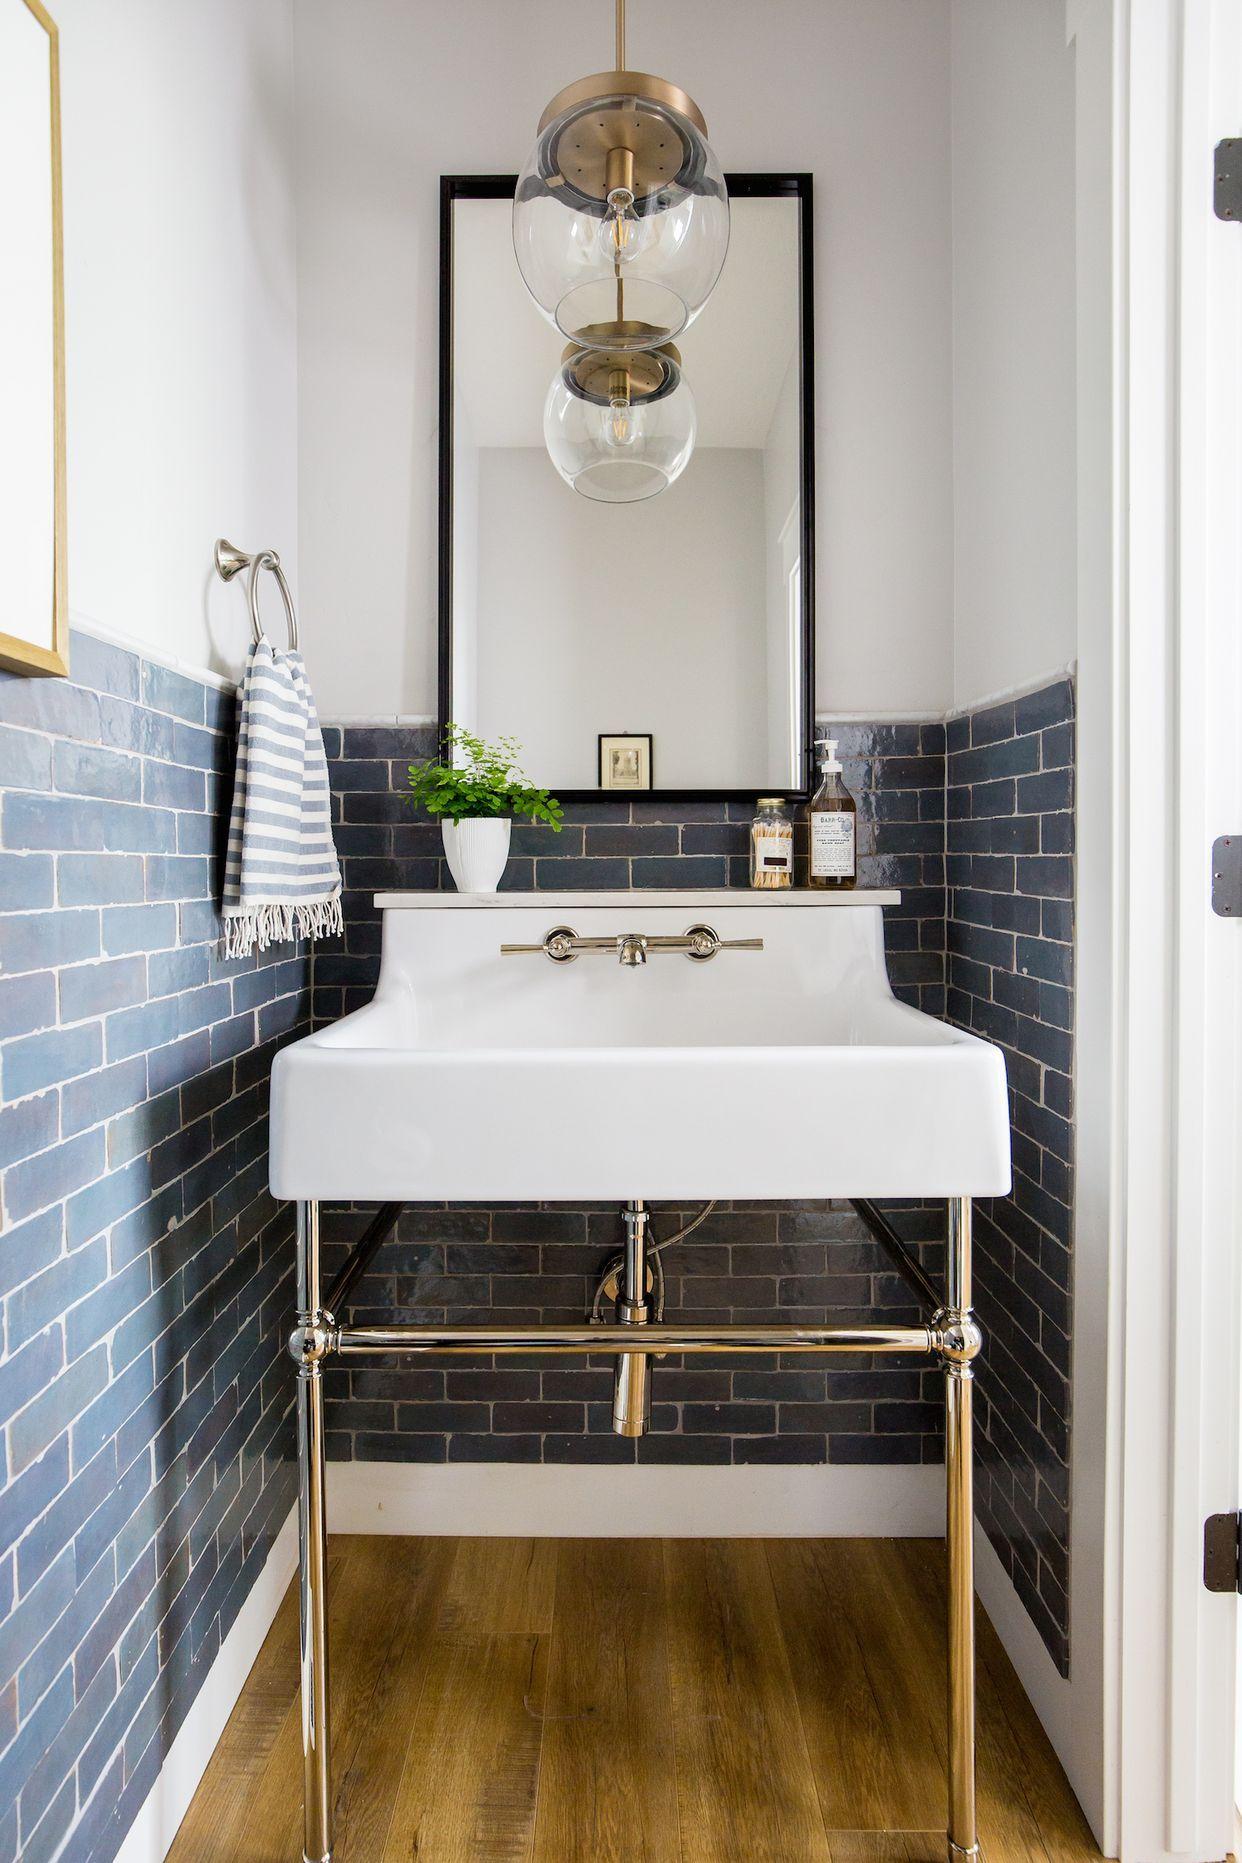 Ferguson Bath Kitchen Lighting Gallery Is Your Bathroom And